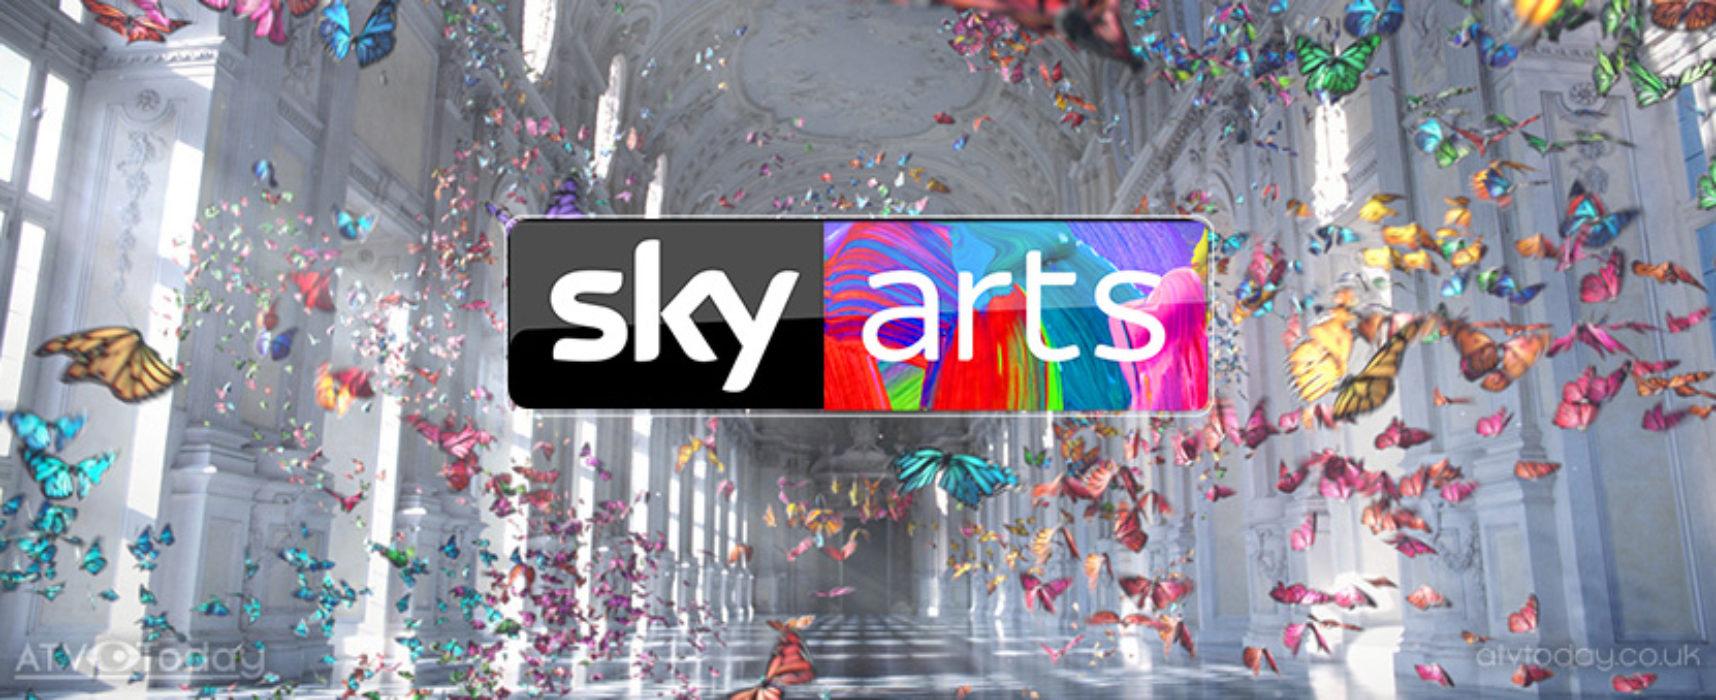 Sky Arts to celebrate T.S. Eliot